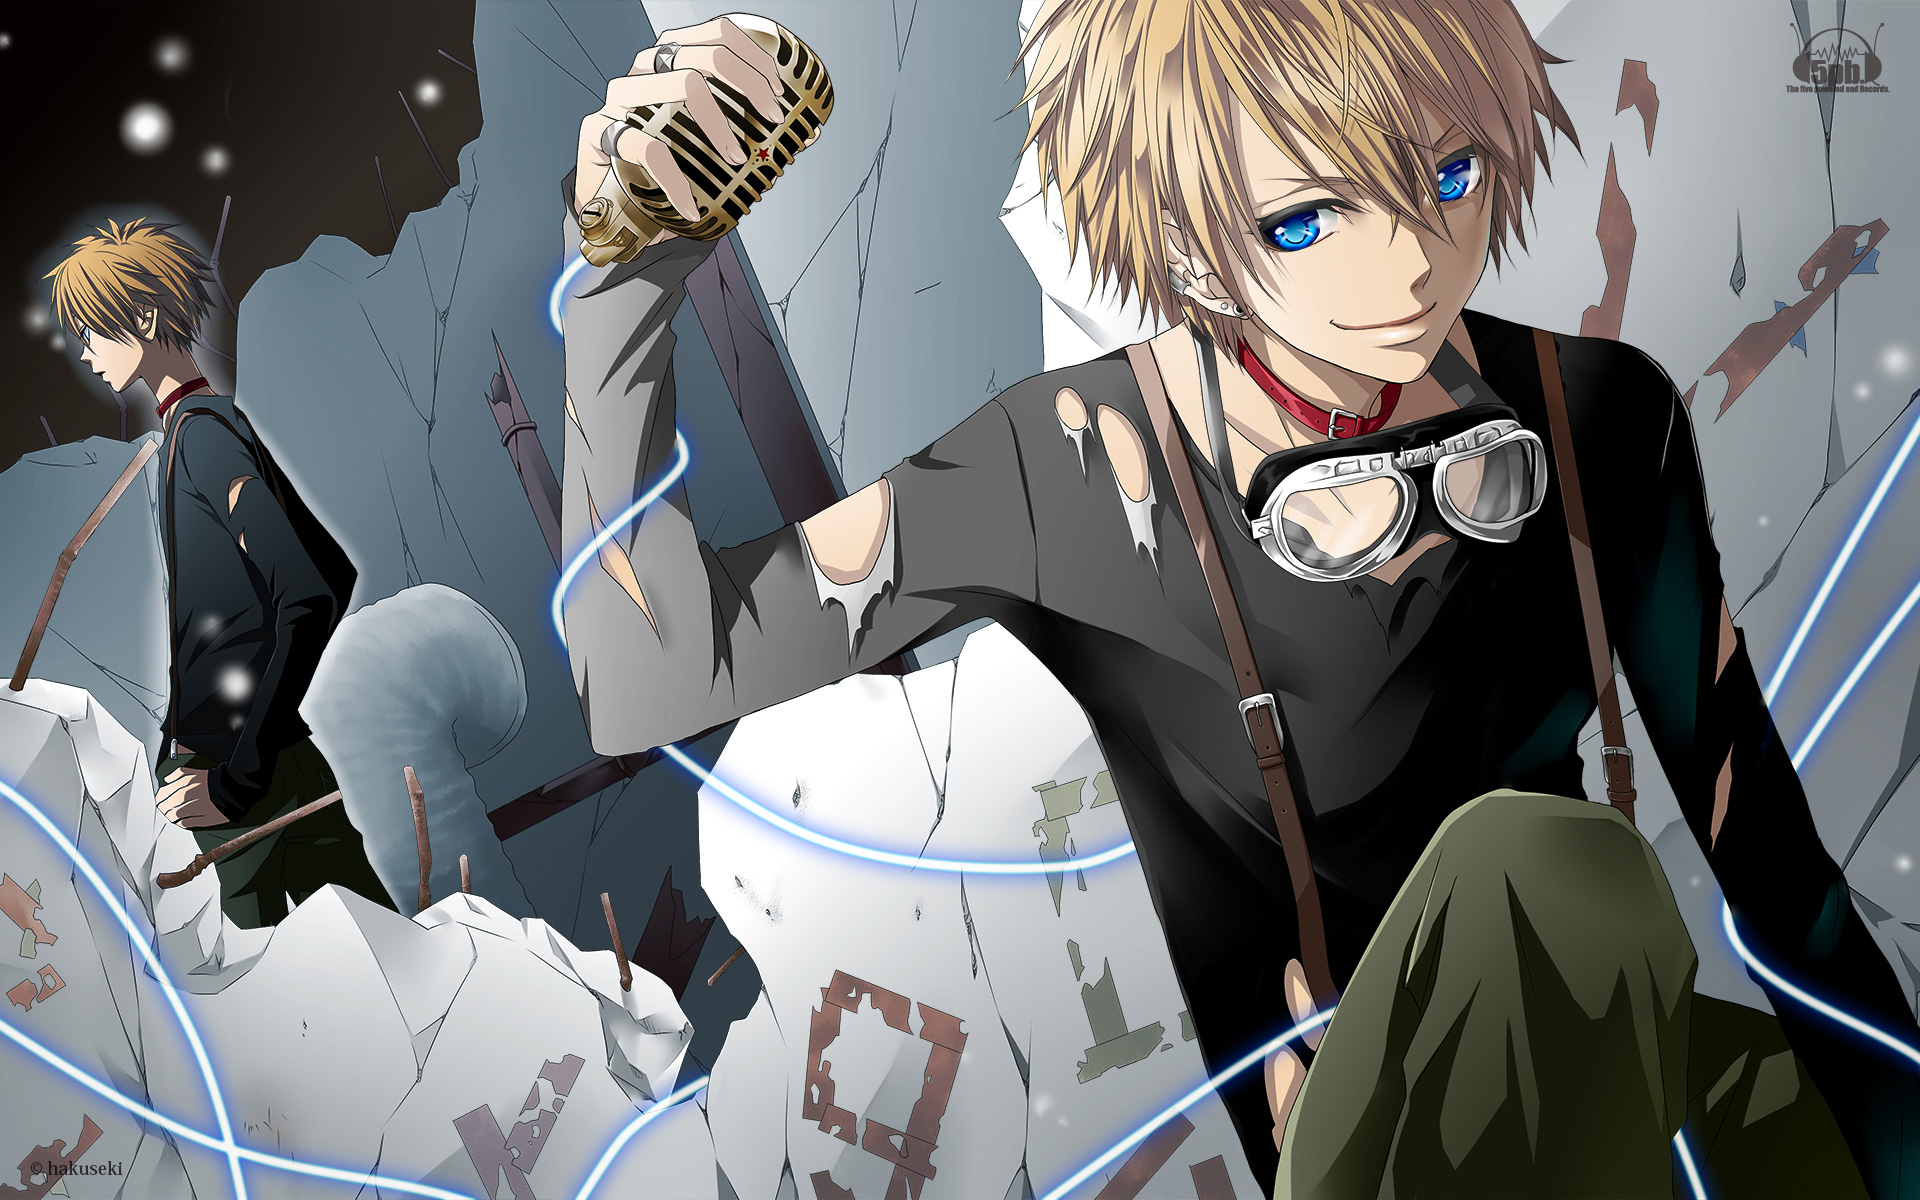 all_male blonde_hair blue_eyes hakuseki kagamine_len male microphone original torn_clothes vocaloid